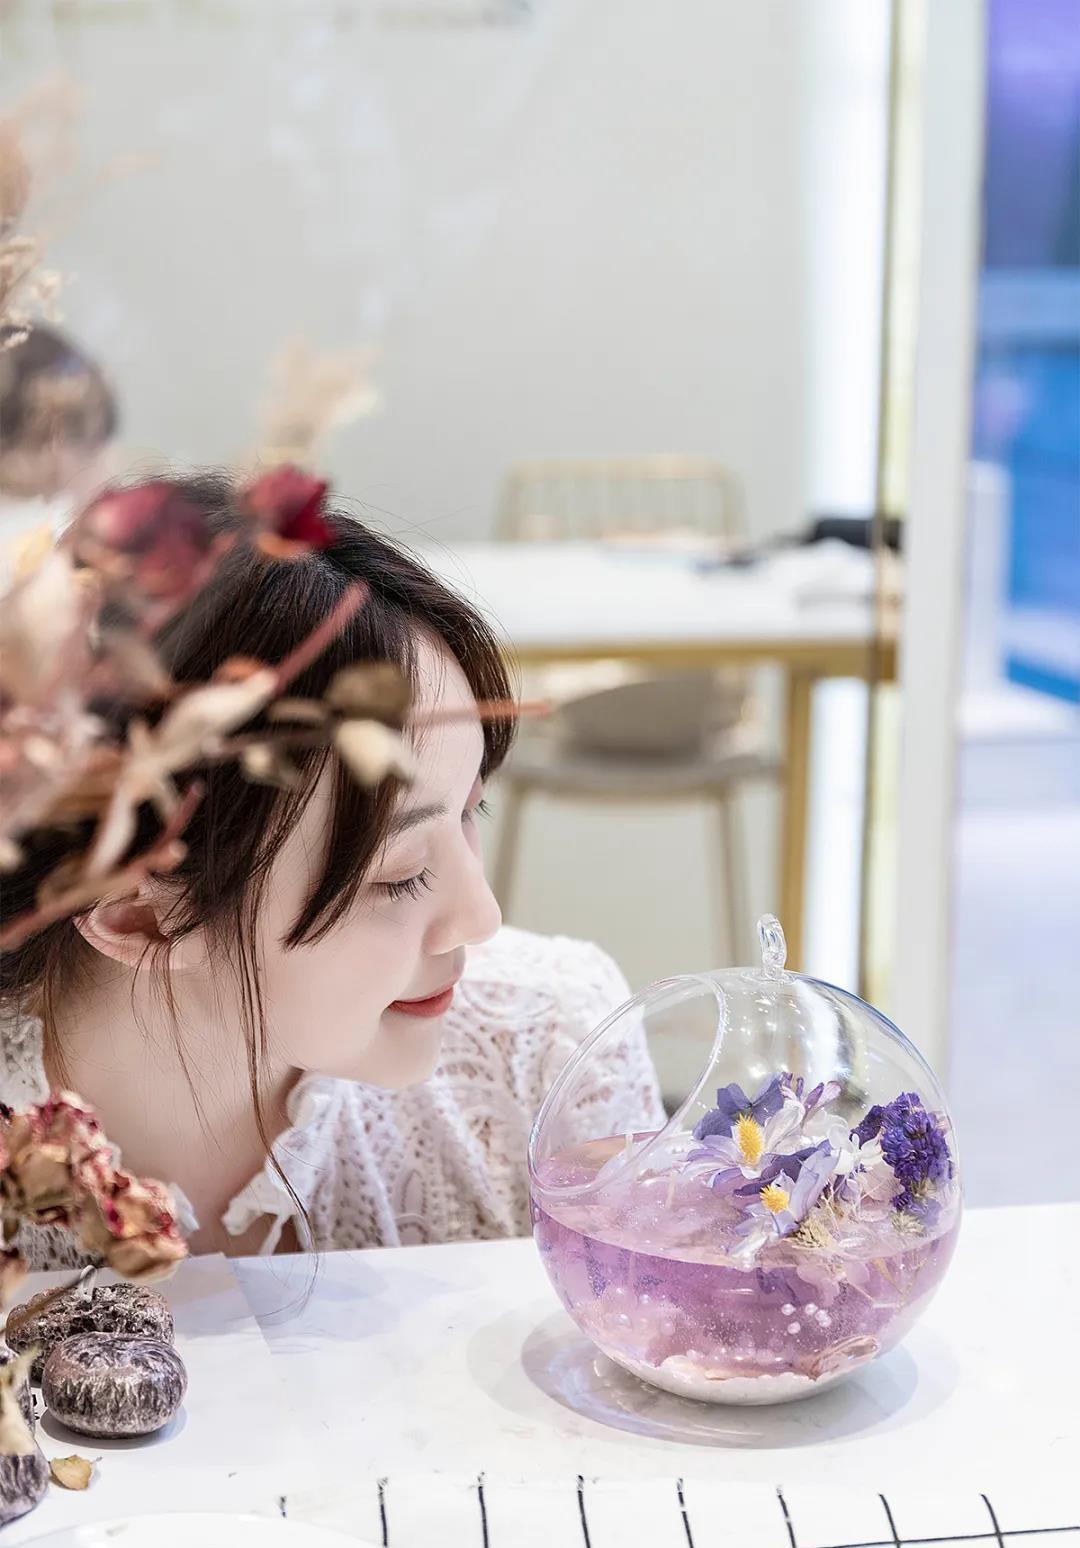 DIY创业丨开一家手工香薰蜡烛店,怎么样?